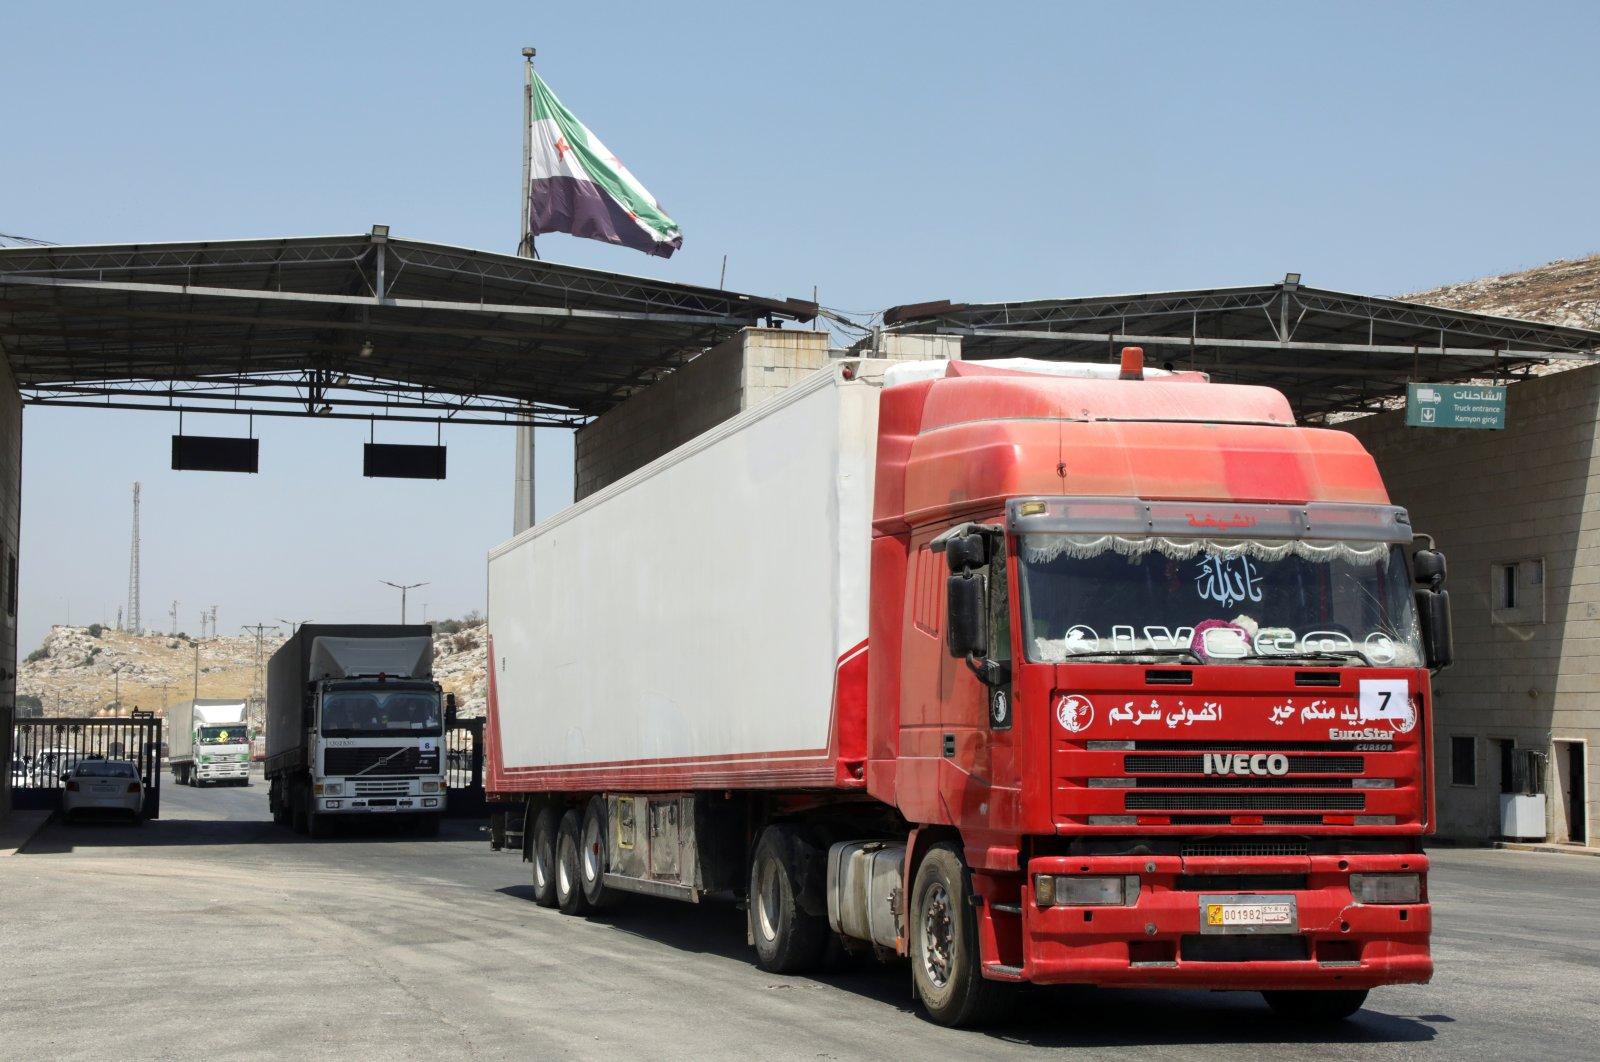 Trucks drive at Bab al-Hawa crossing at the Syrian-Turkish border, in Idlib governorate, Syria, June 30, 2021. (Reuters Photo)